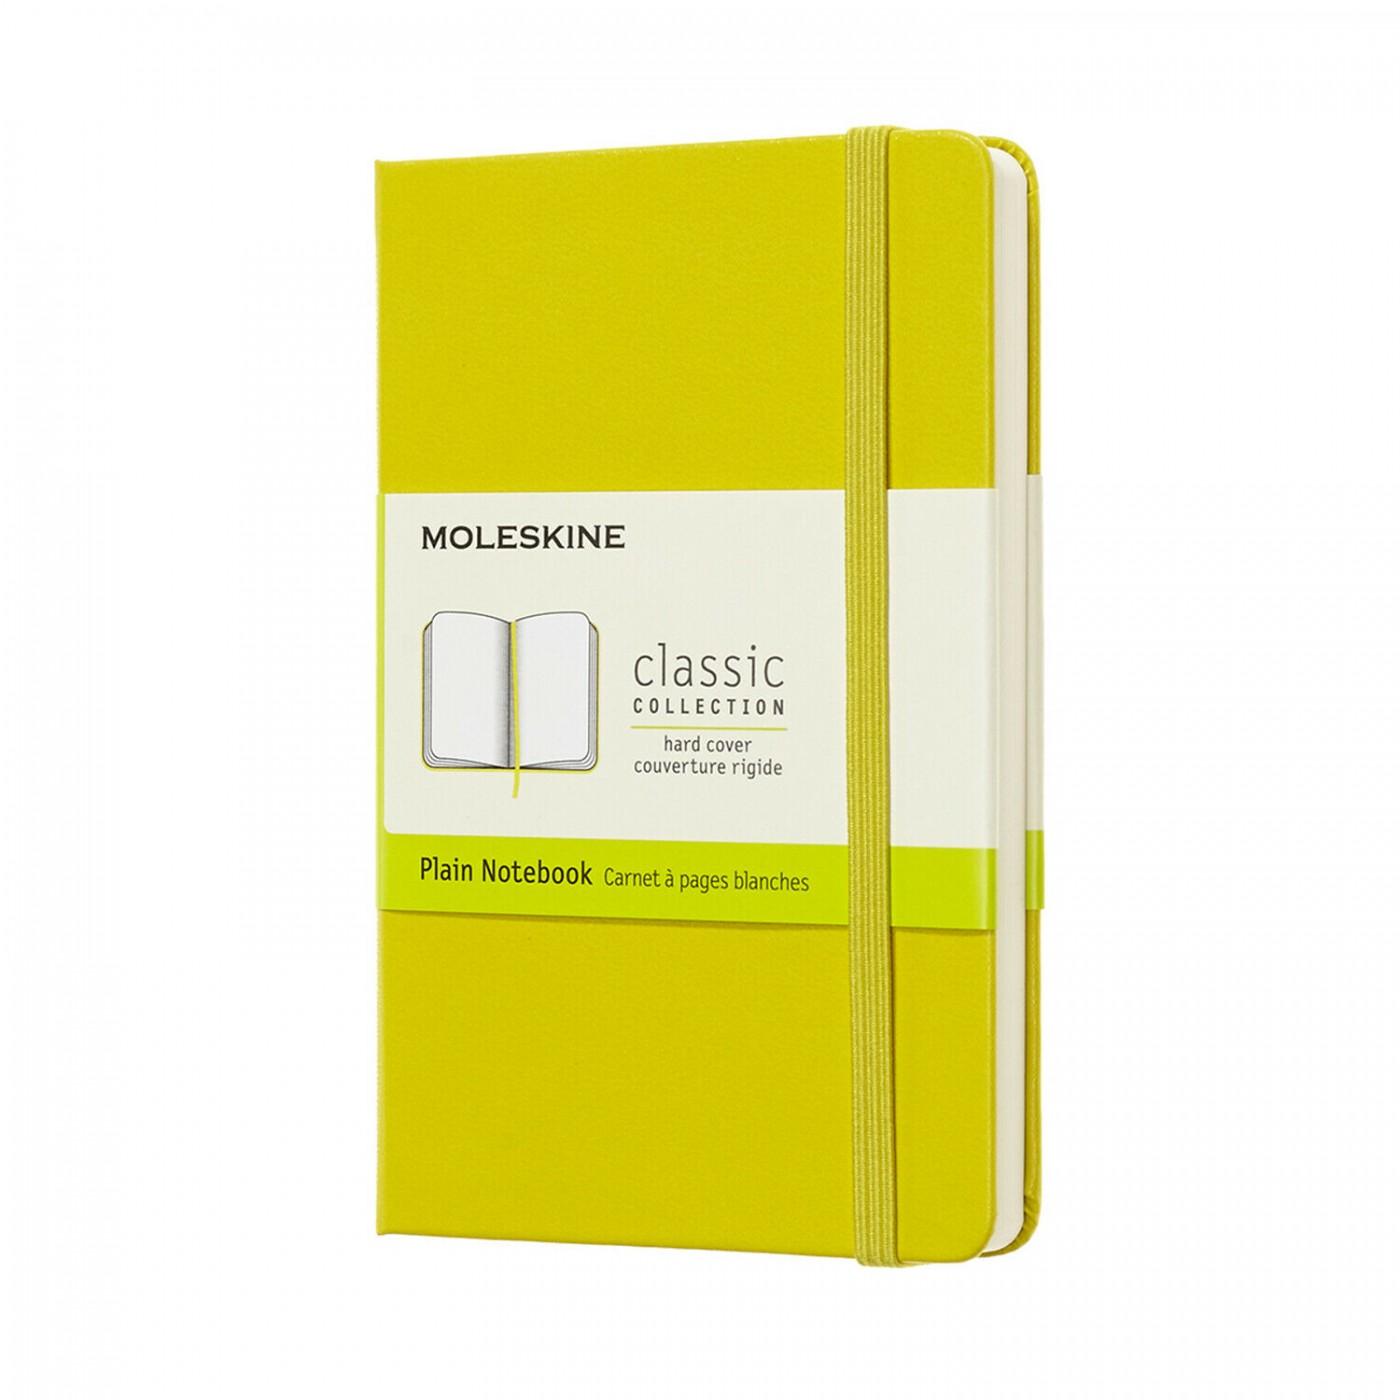 MOLESKINE taccuino Classic, pocket, copertina rigida giallo